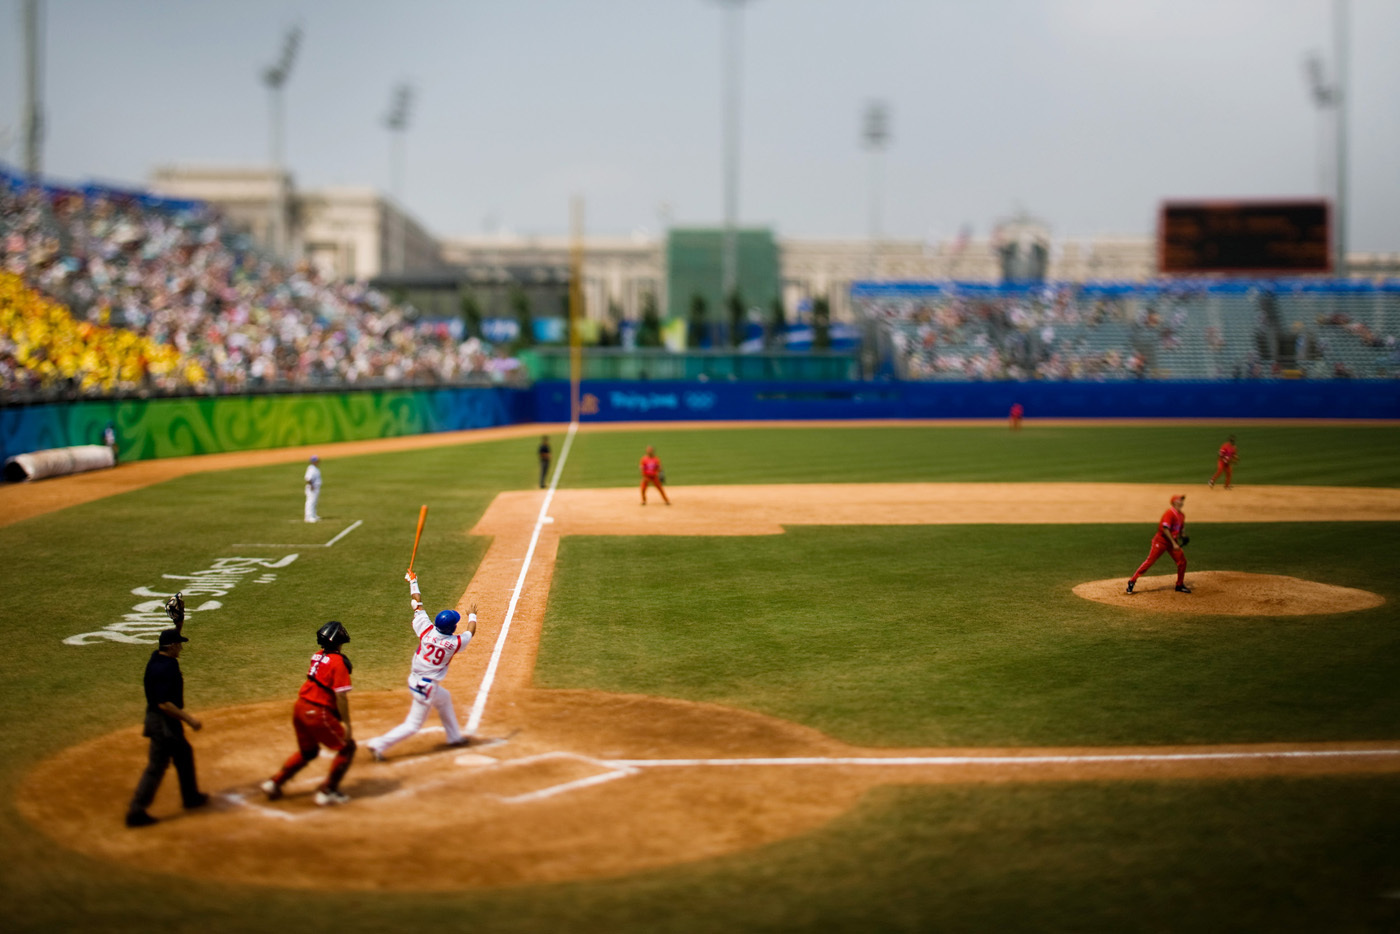 Sport Olympic Baseball The Last Year As An Olympic